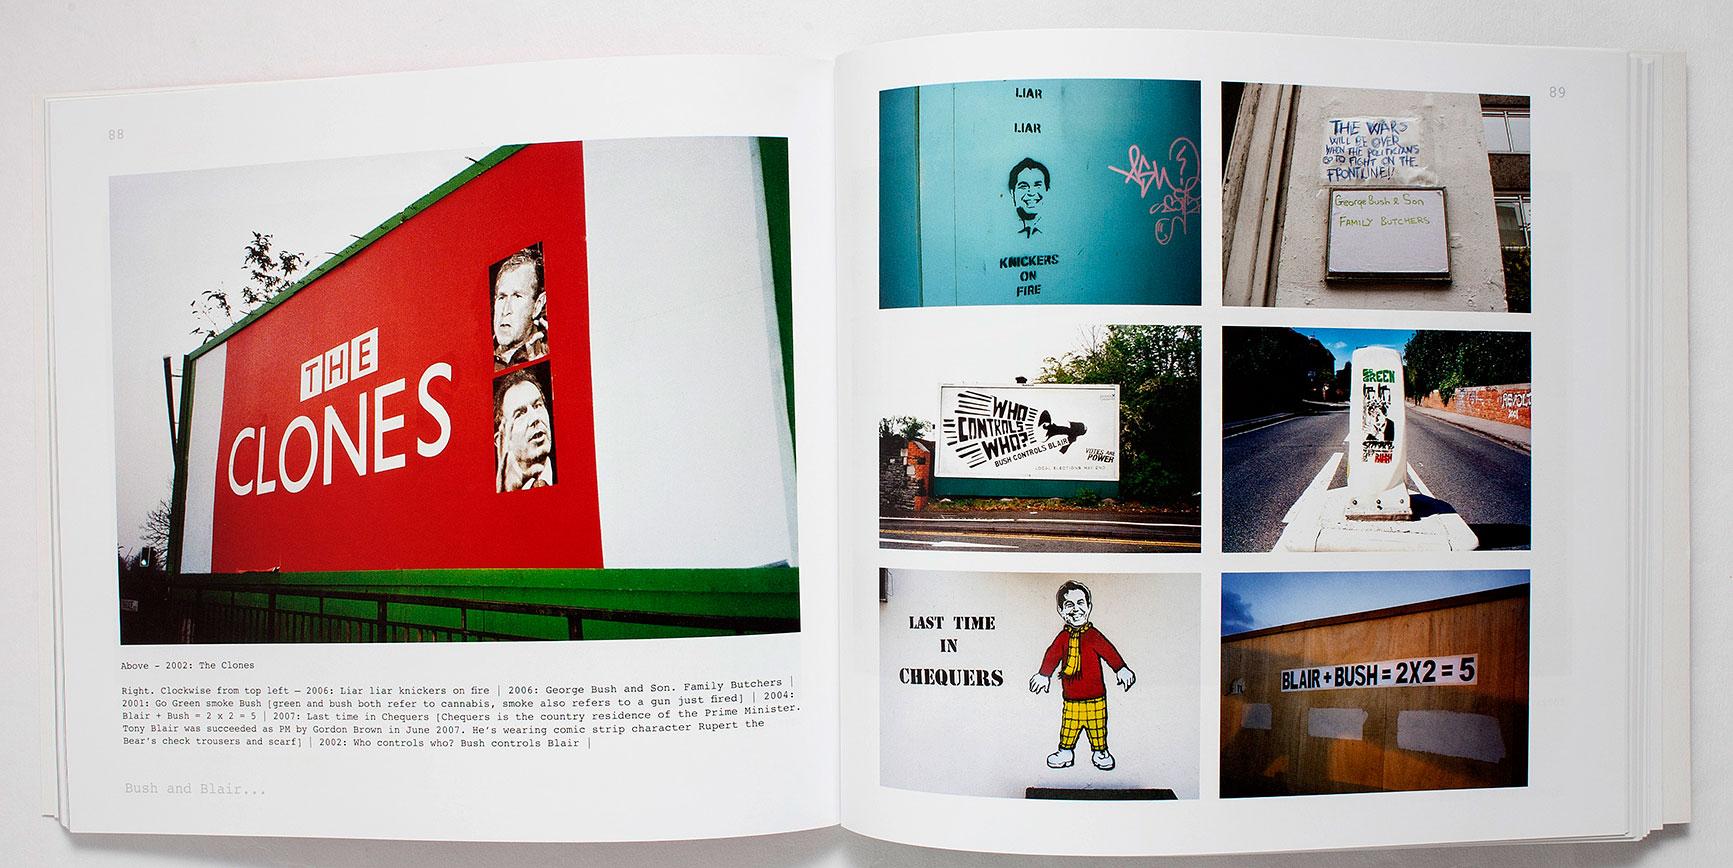 epm-print-management-political-books-don-pedro-3.jpg